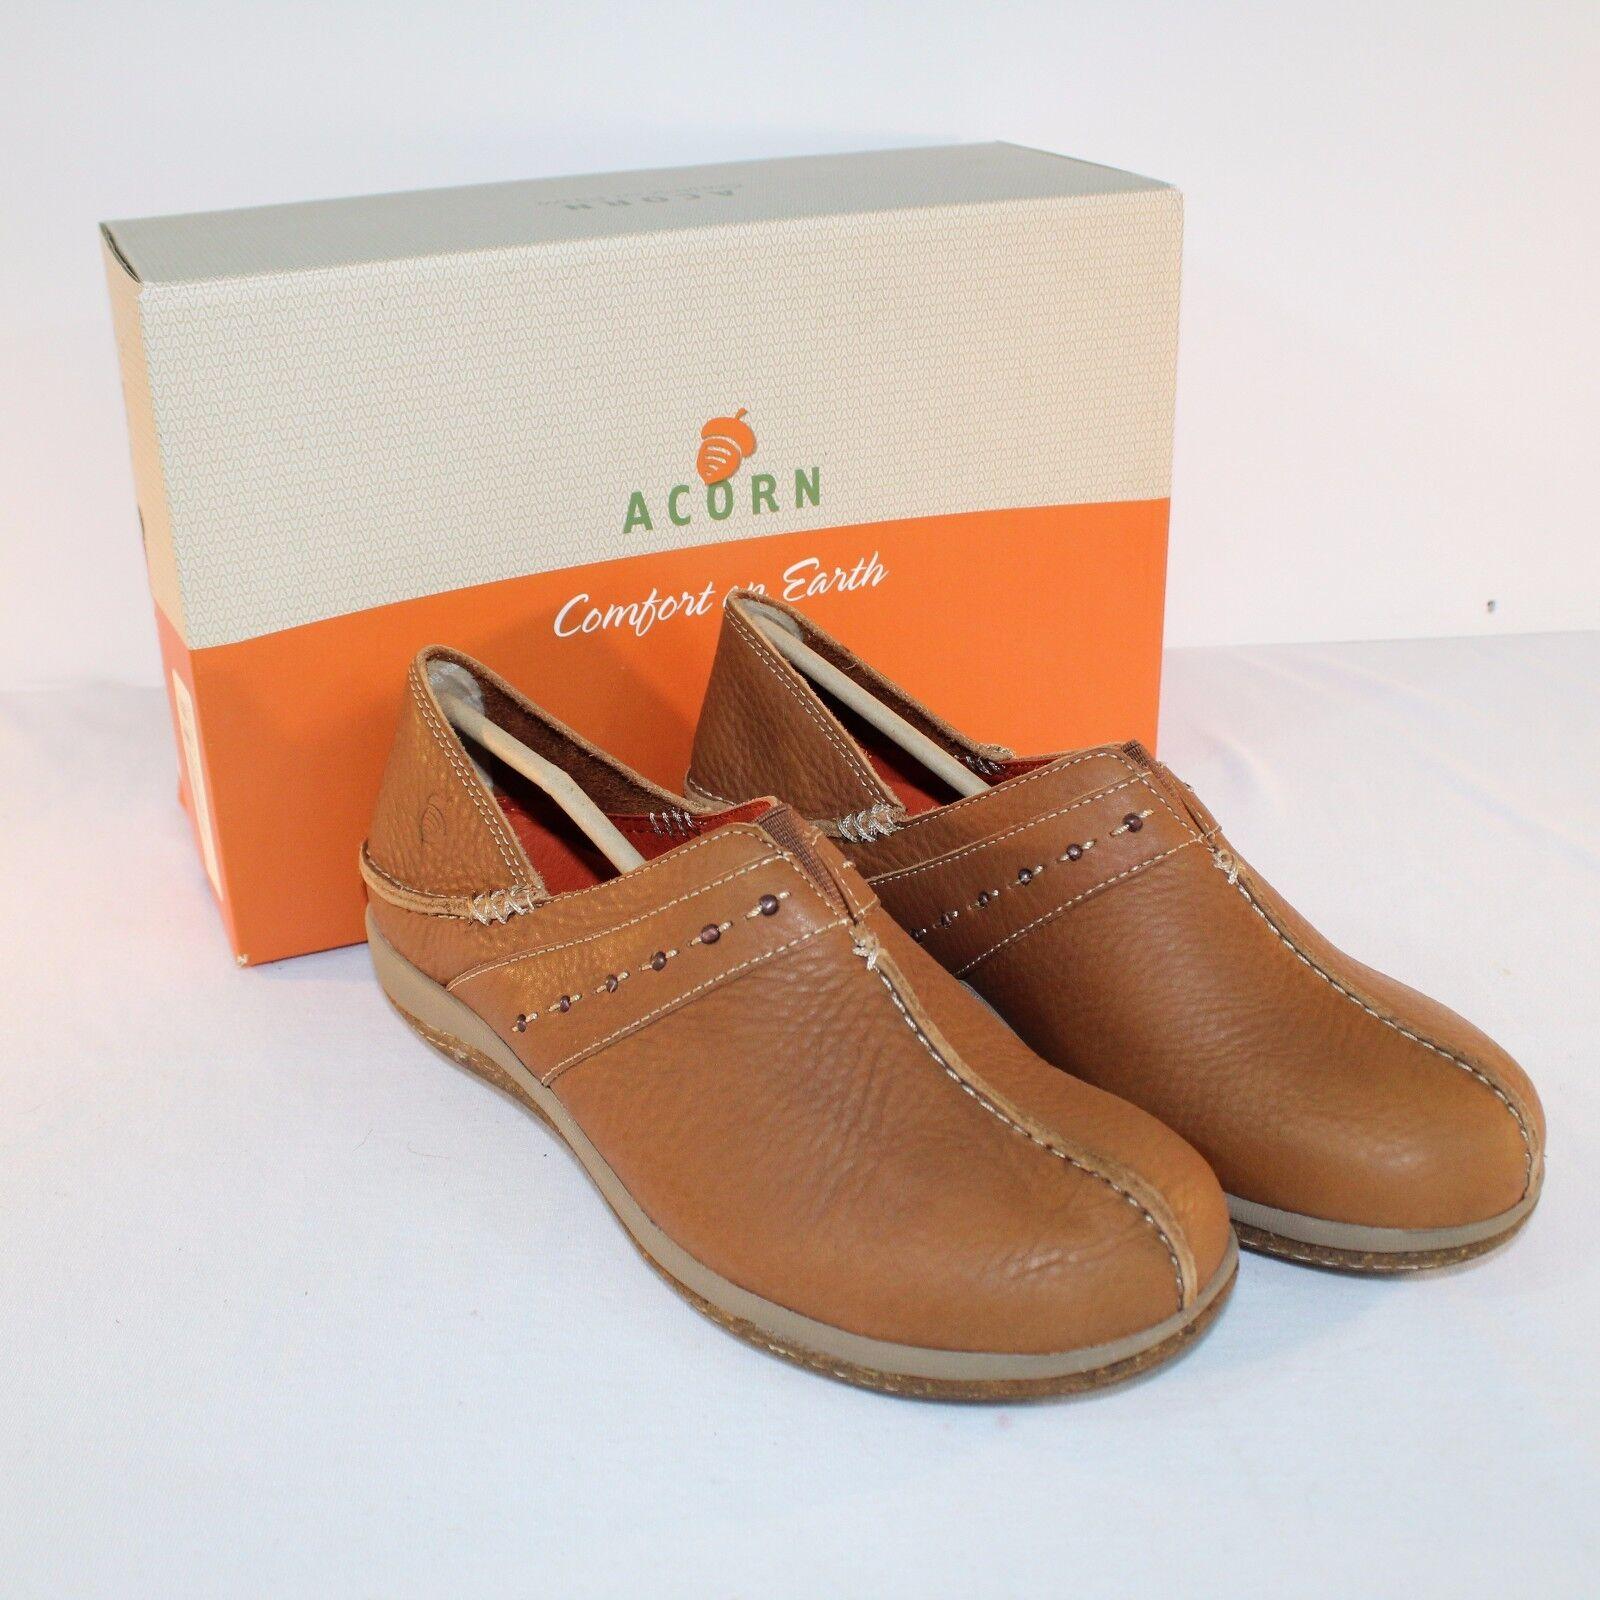 Acorn C2G Lite Moc Whiskey Brown Pelle Slip On Moccasin Shoe Size 7